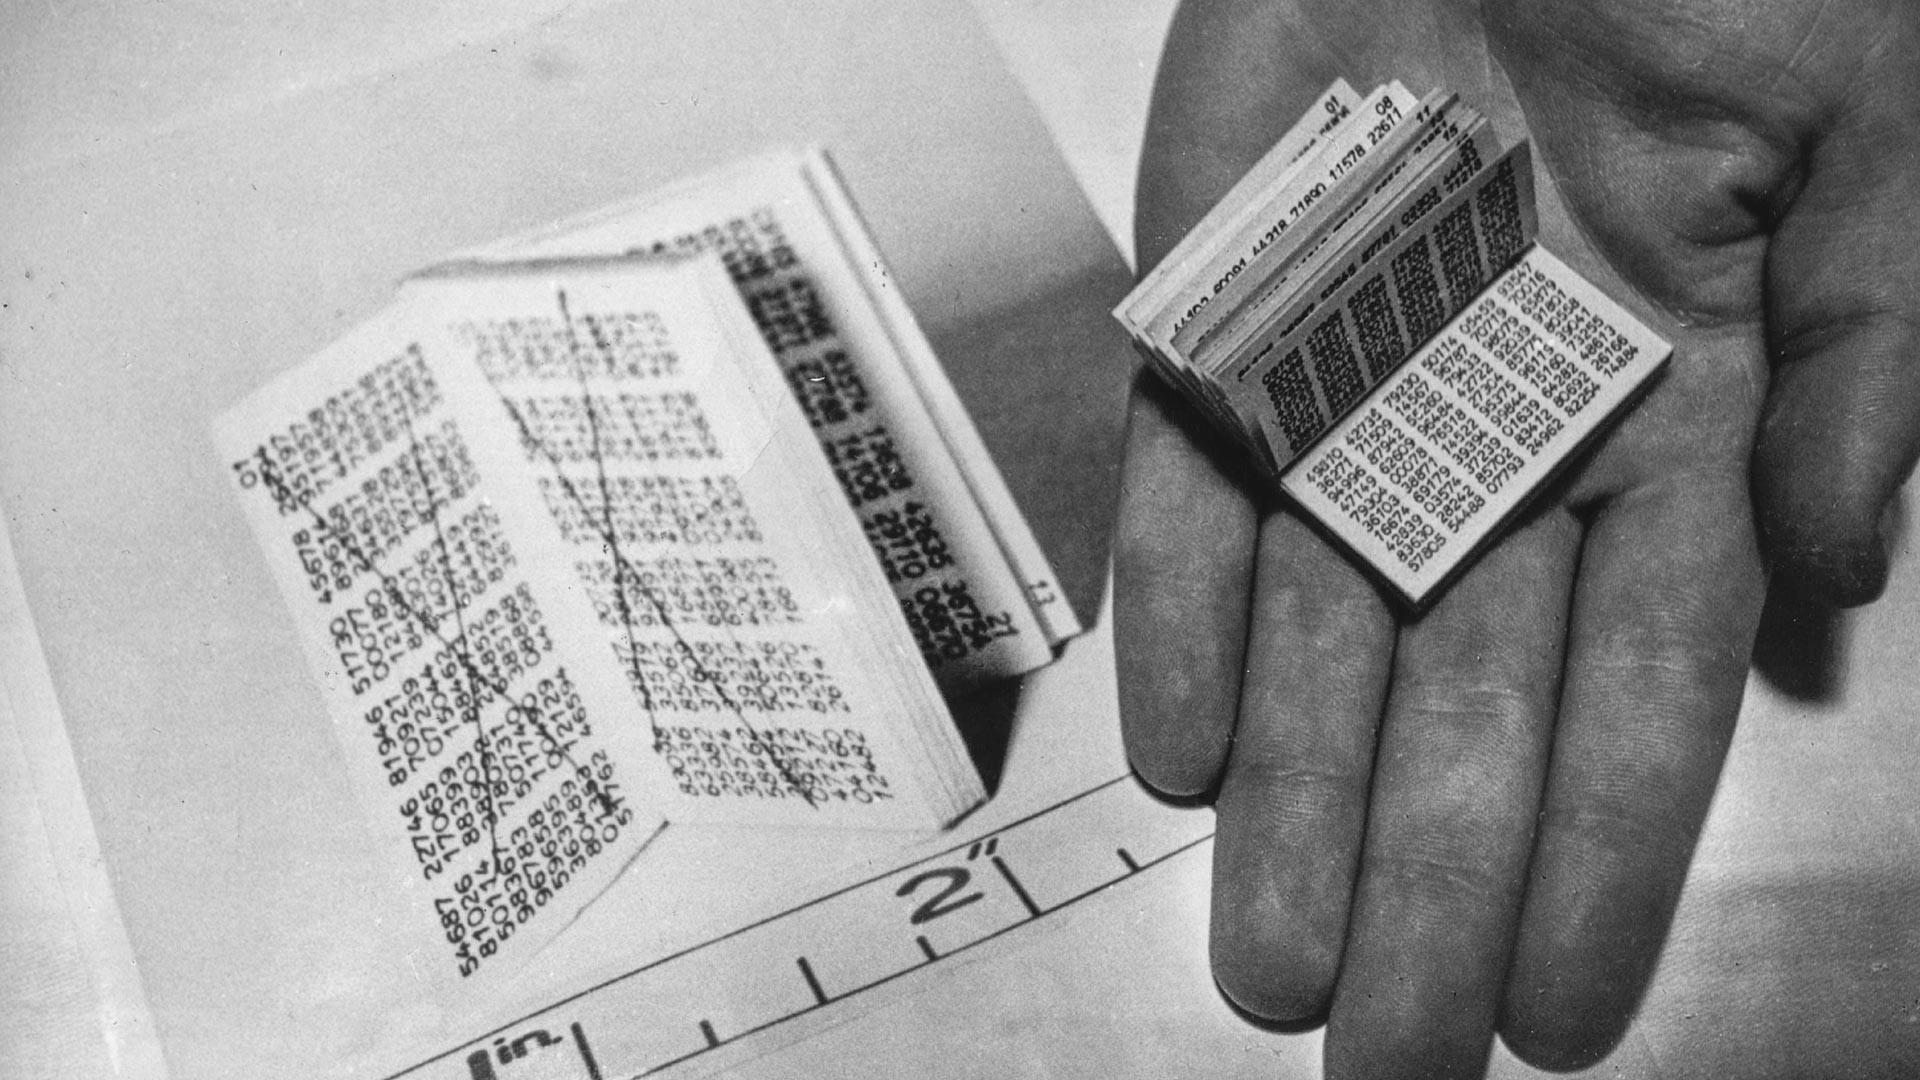 Buku kode mungil (diperbesar pada gambar sebelah kiri) berisi rangkaian angka, yang menurut Jaksa Agung Inggris Sir Elwyn Jones, digunakan mata-mata untuk memecahkan pesan rahasia dari Moskow.